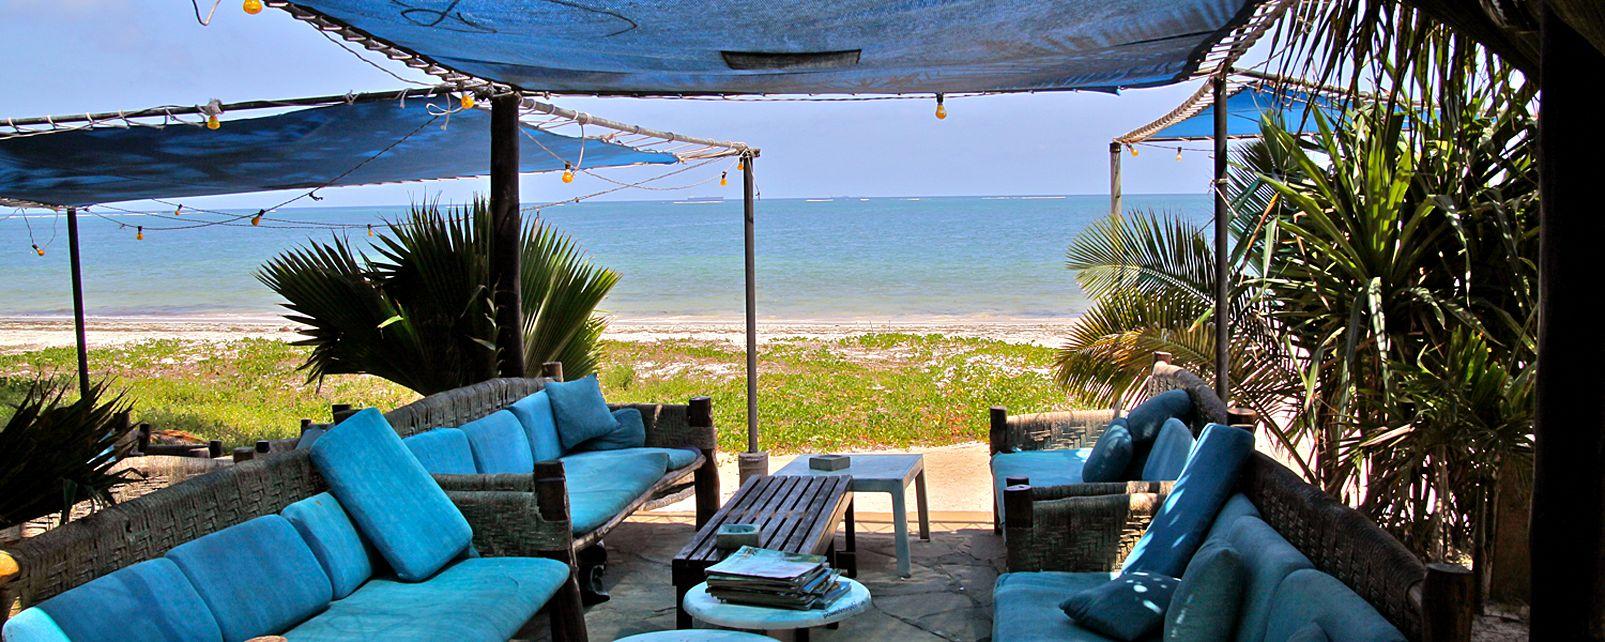 Nyali Beach Hotel Photos